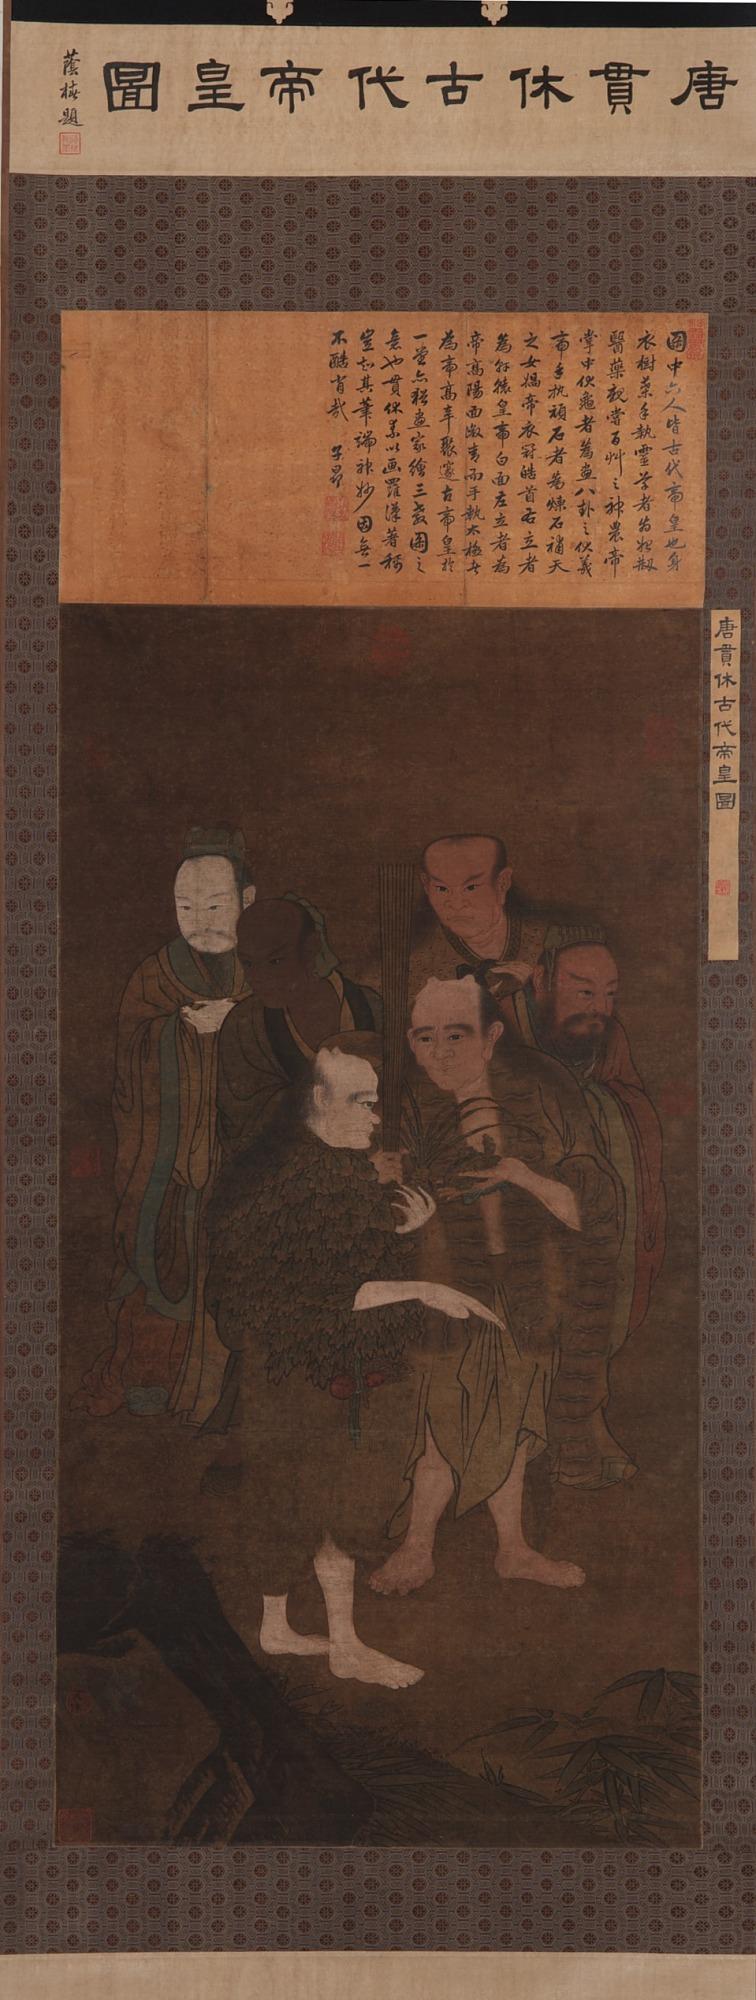 Emperors of Antiquity